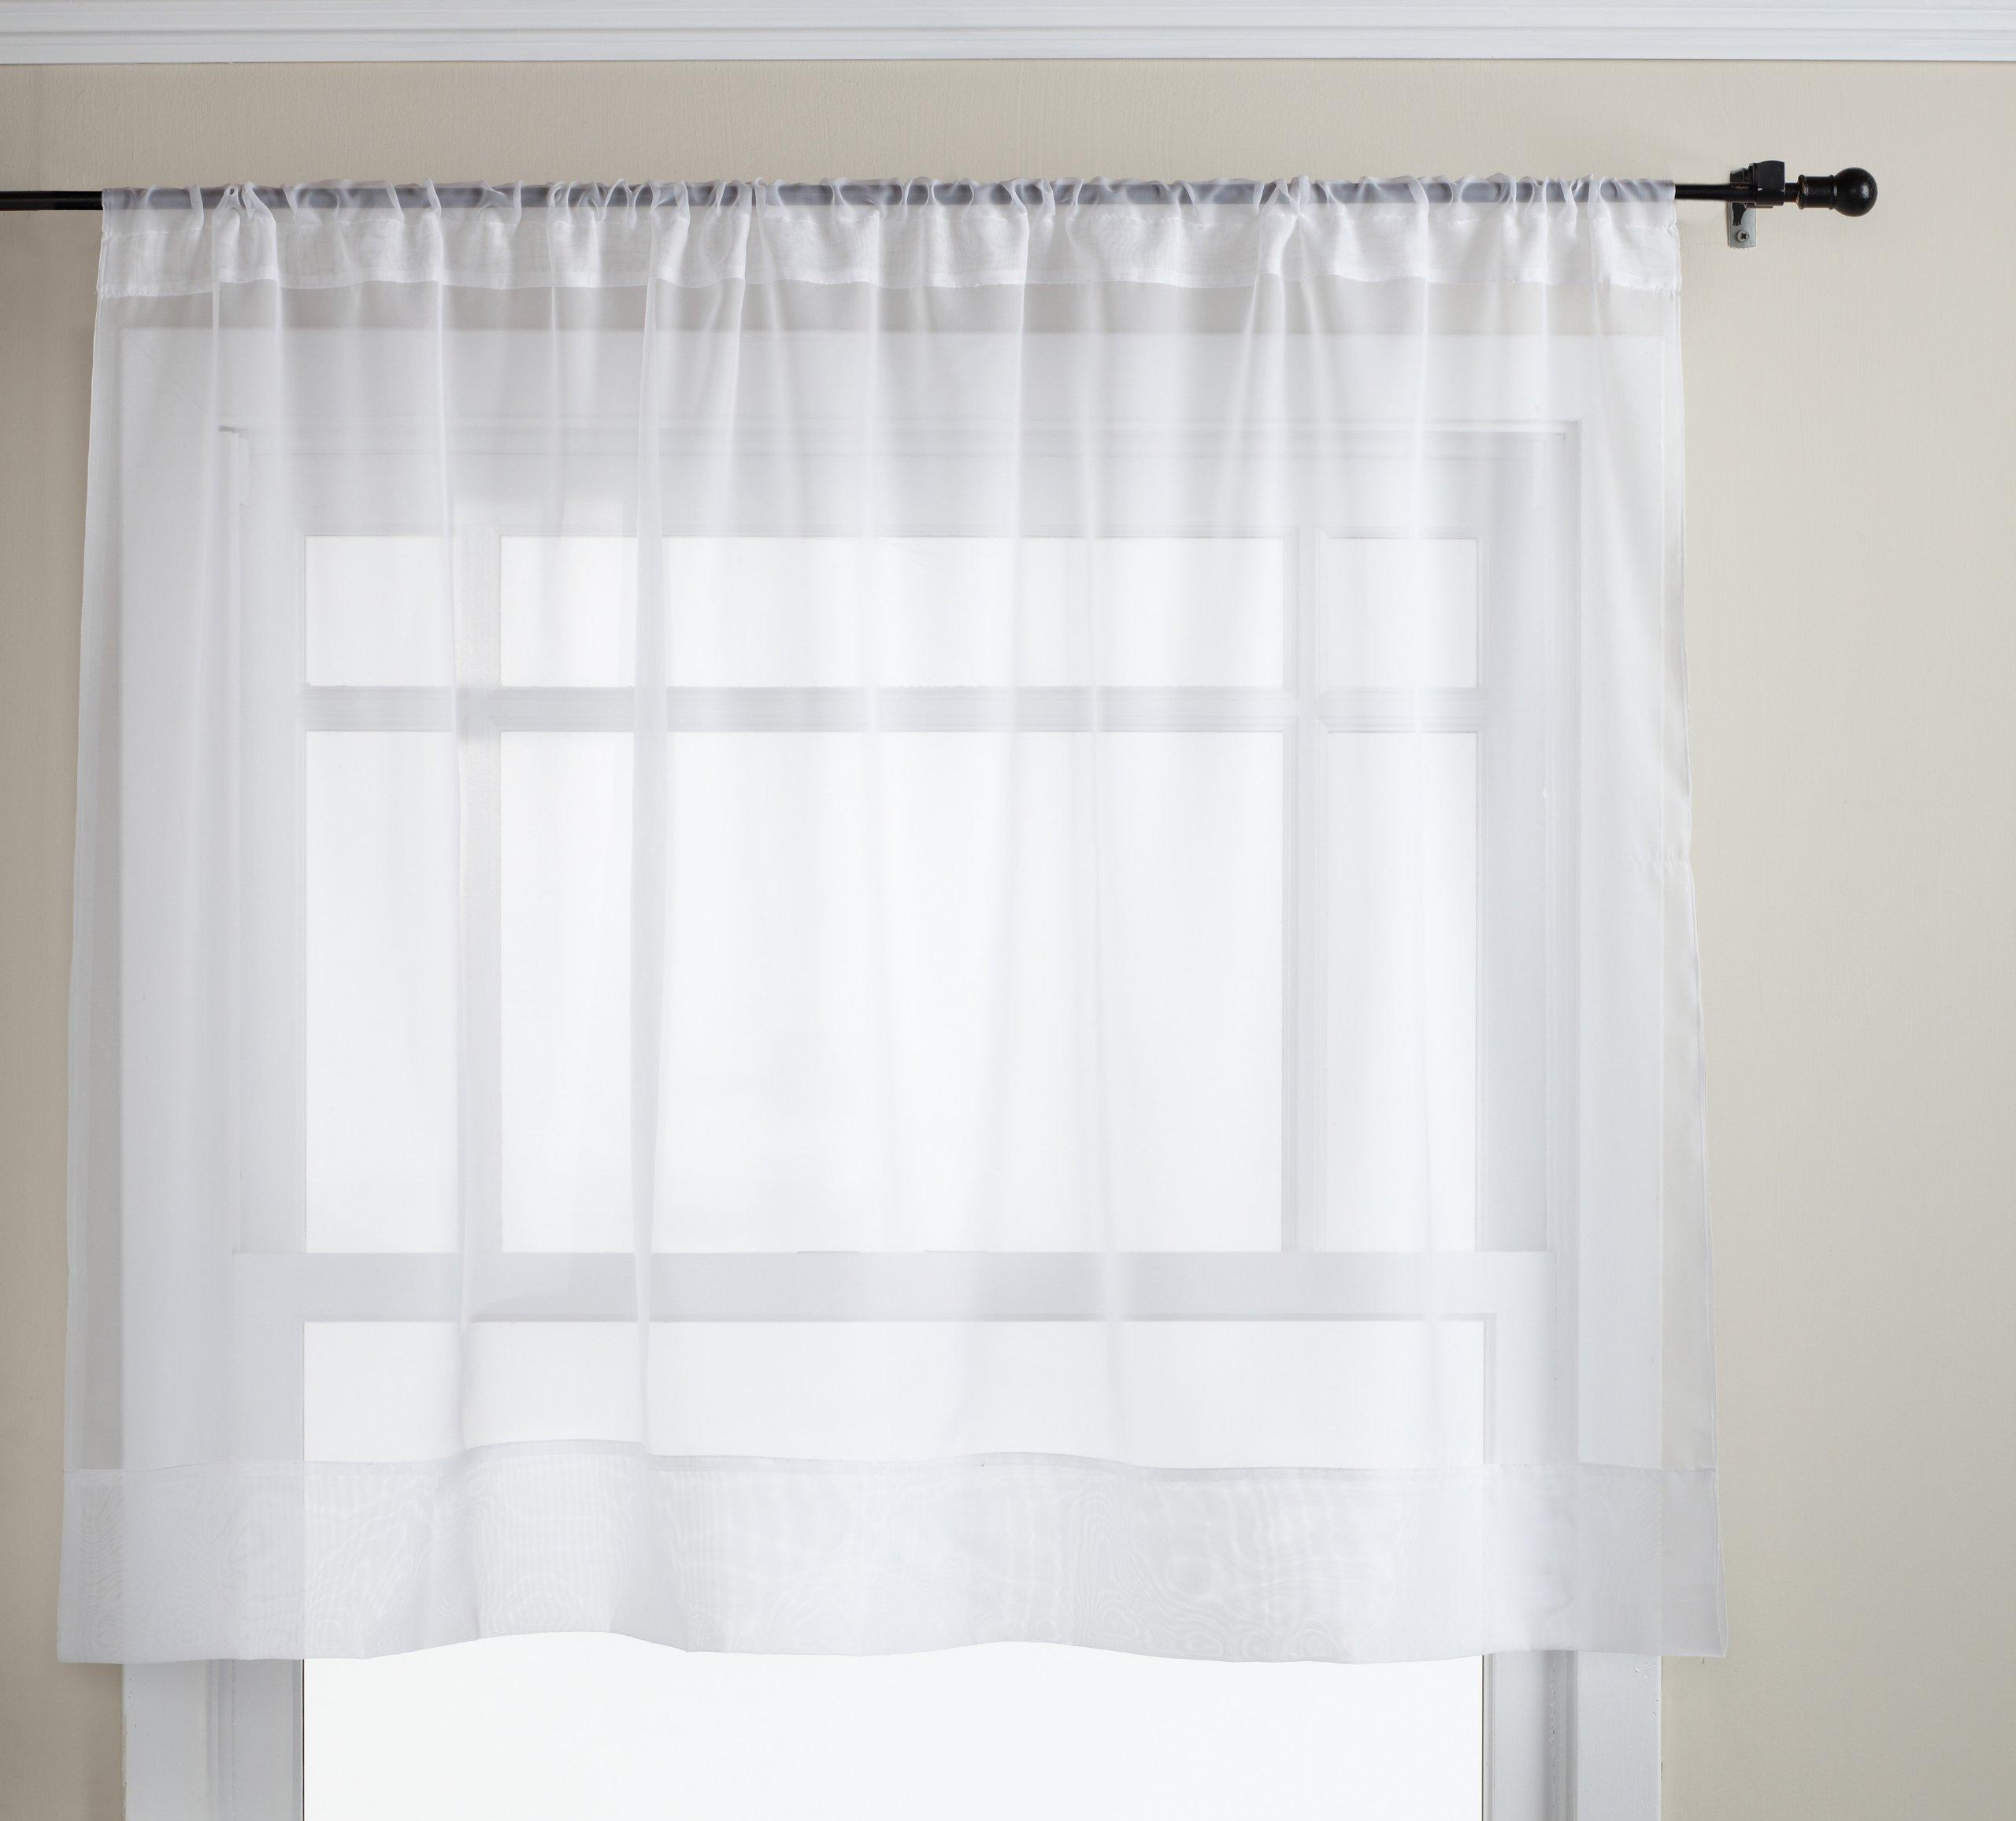 Sheer Kitchen Curtains Amazon Com: Sheer Cafe Curtains: Amazon.com